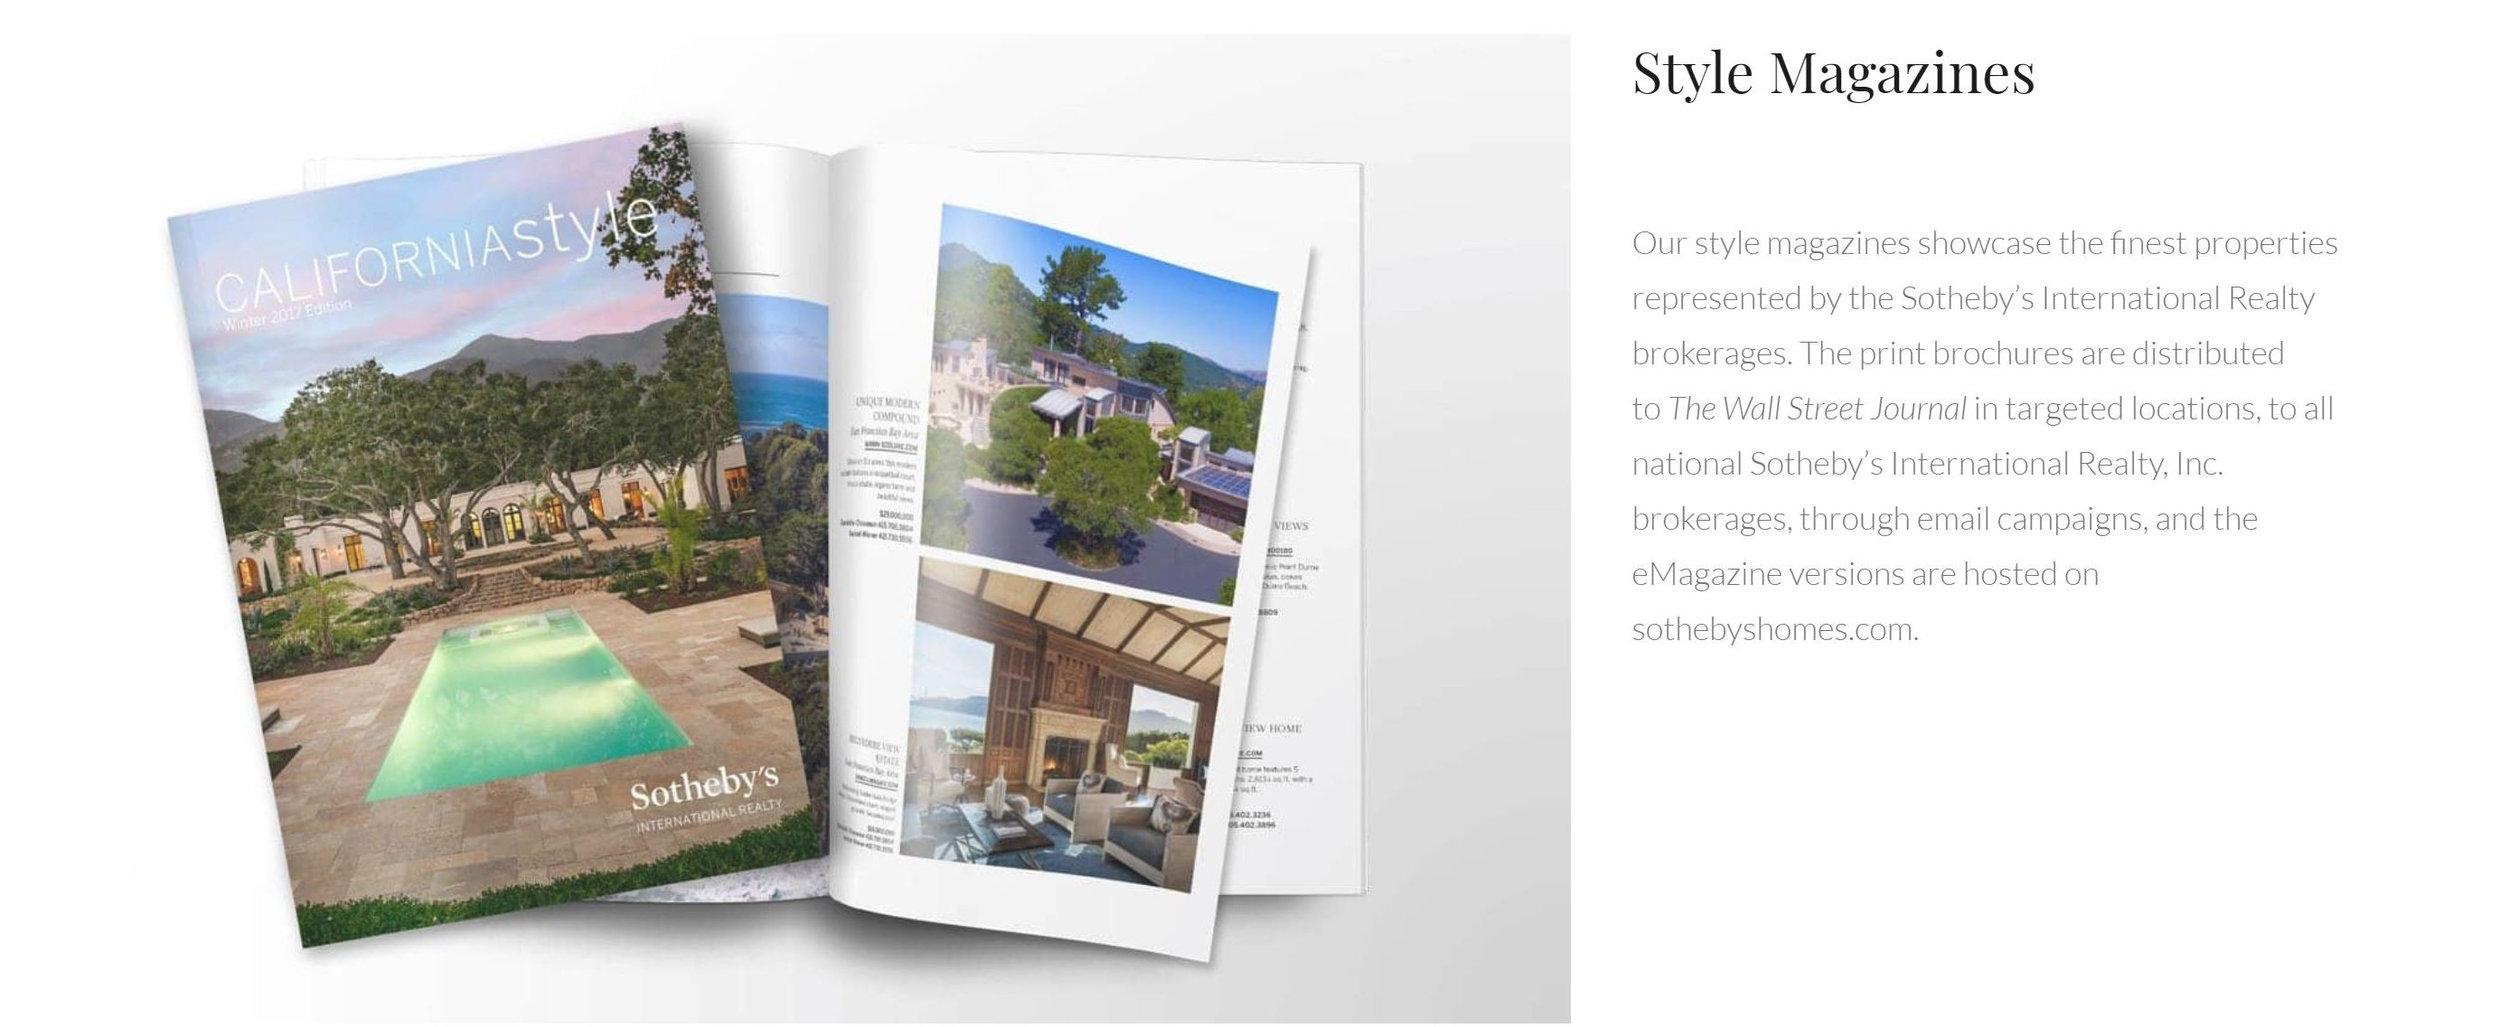 style_magazines.JPG